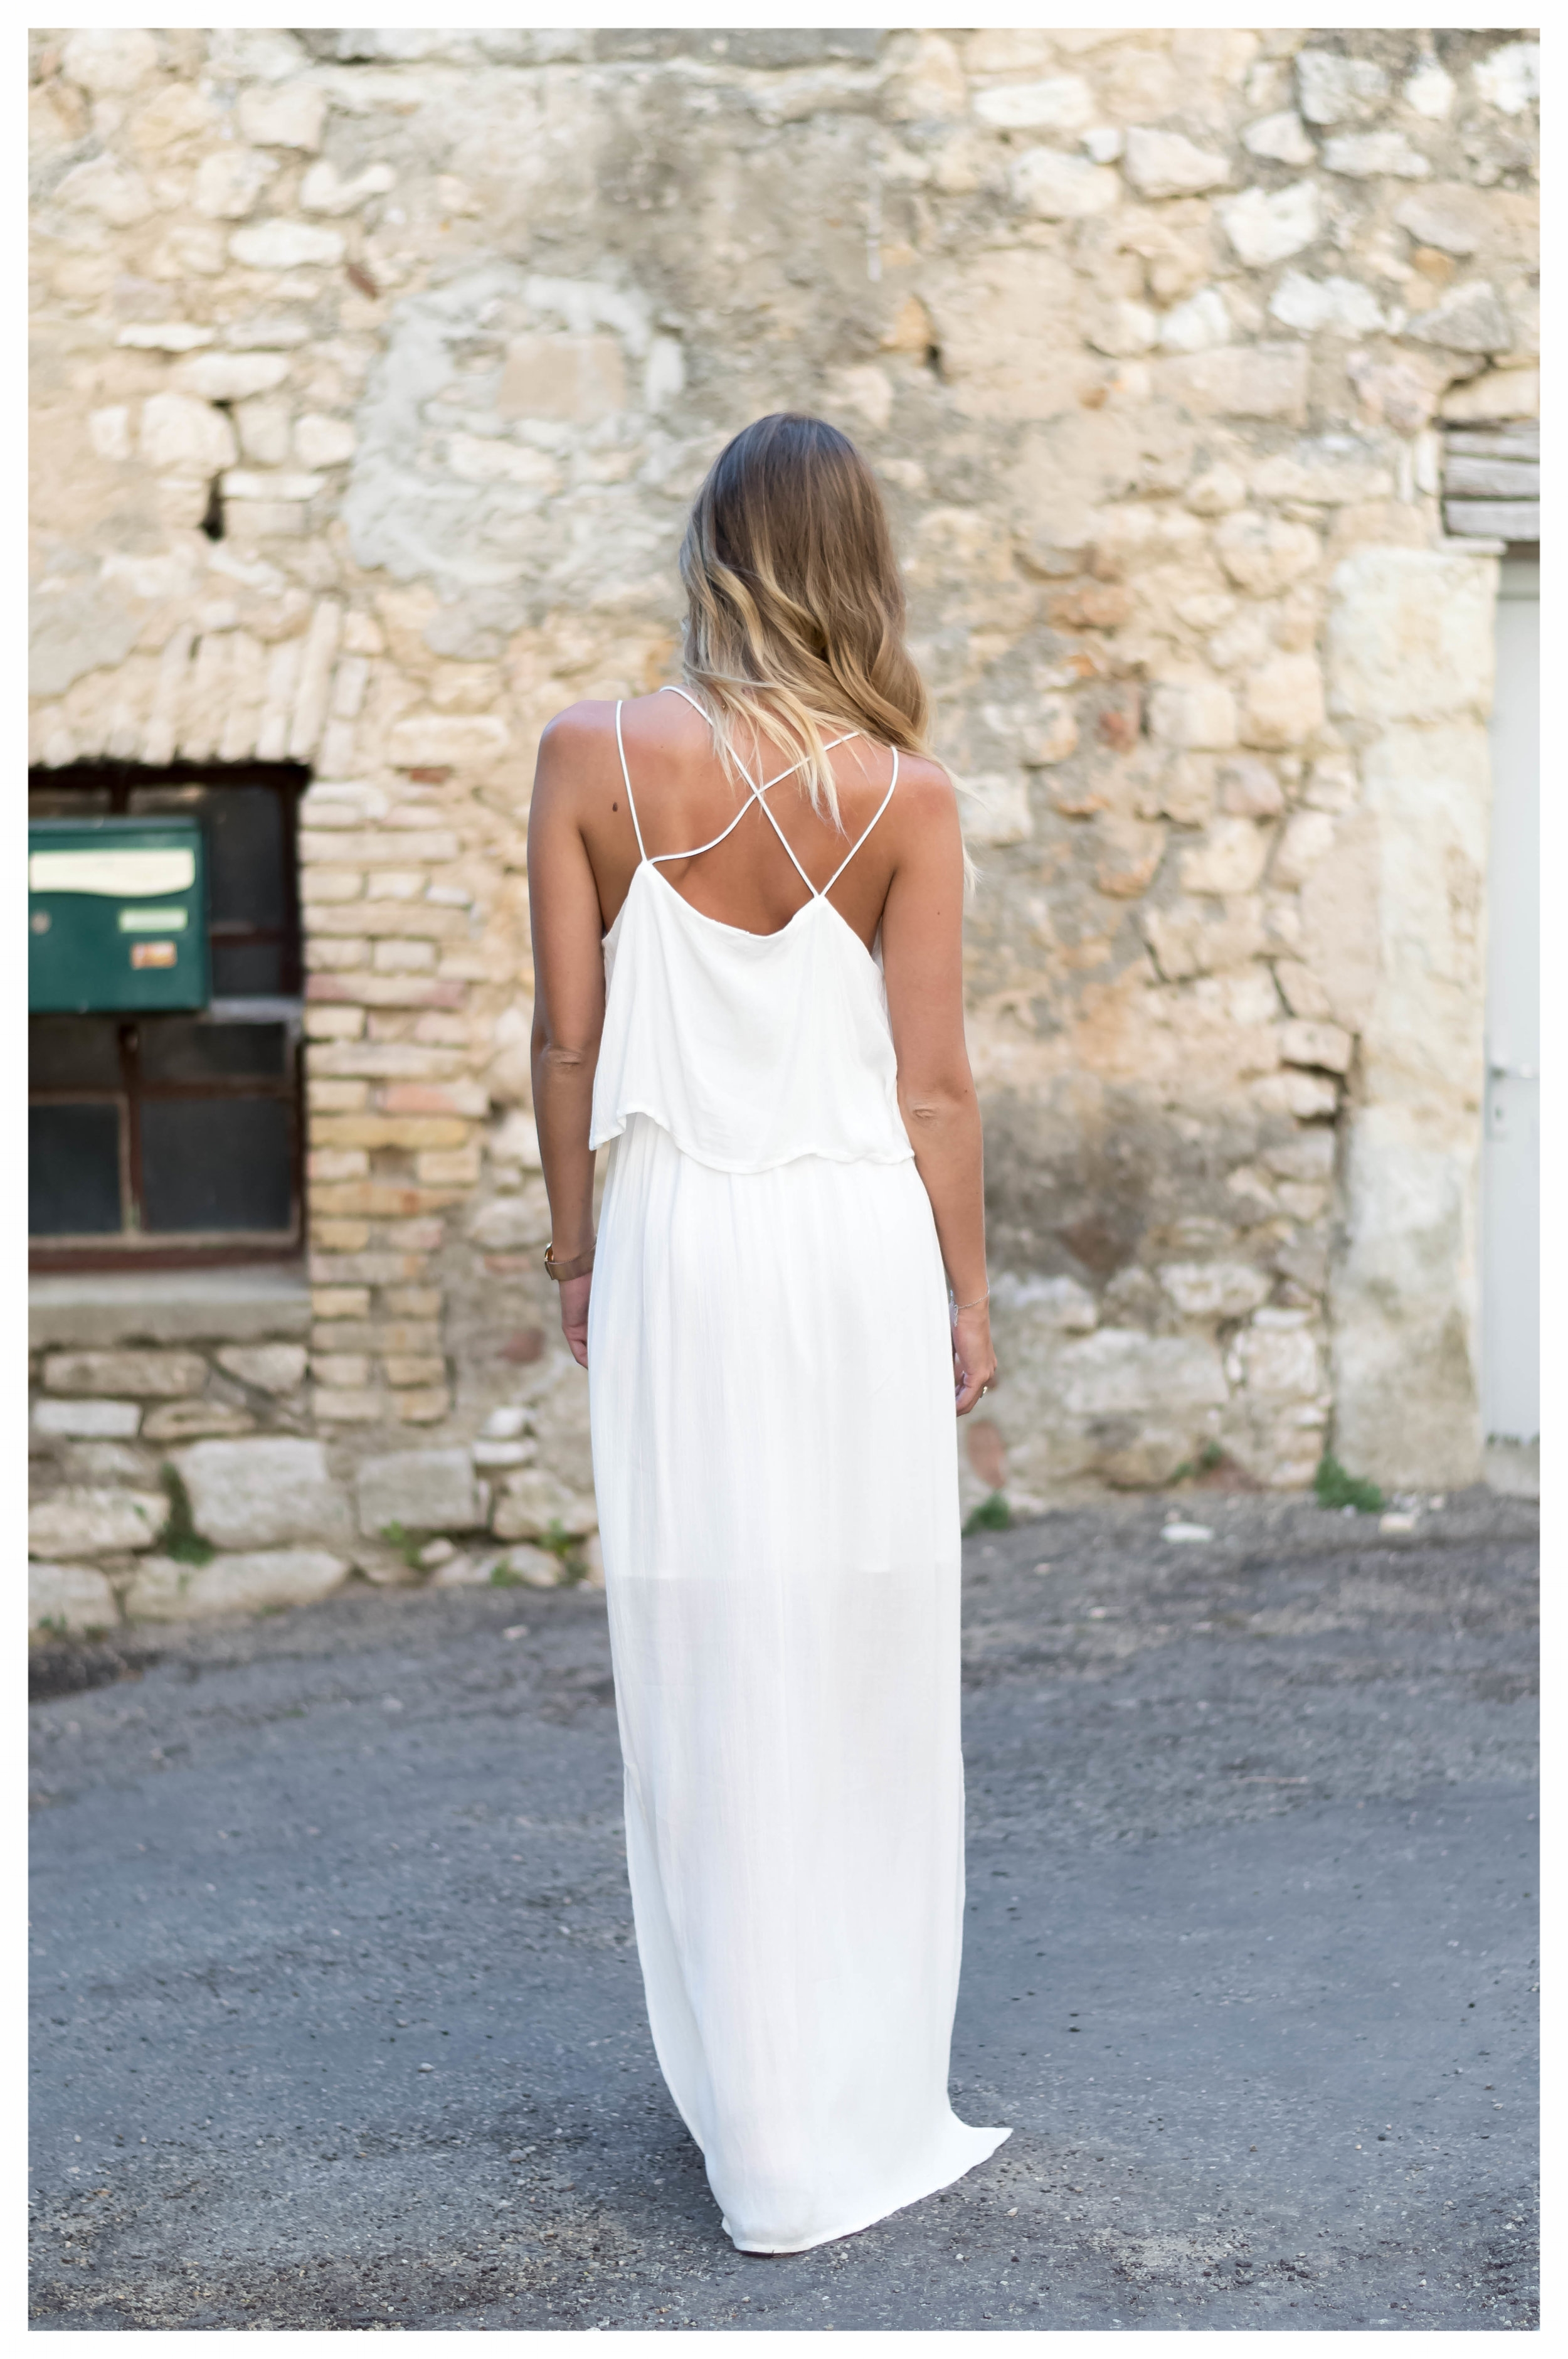 White Dress - OSIARAH.COM (11 sur 16).jpg